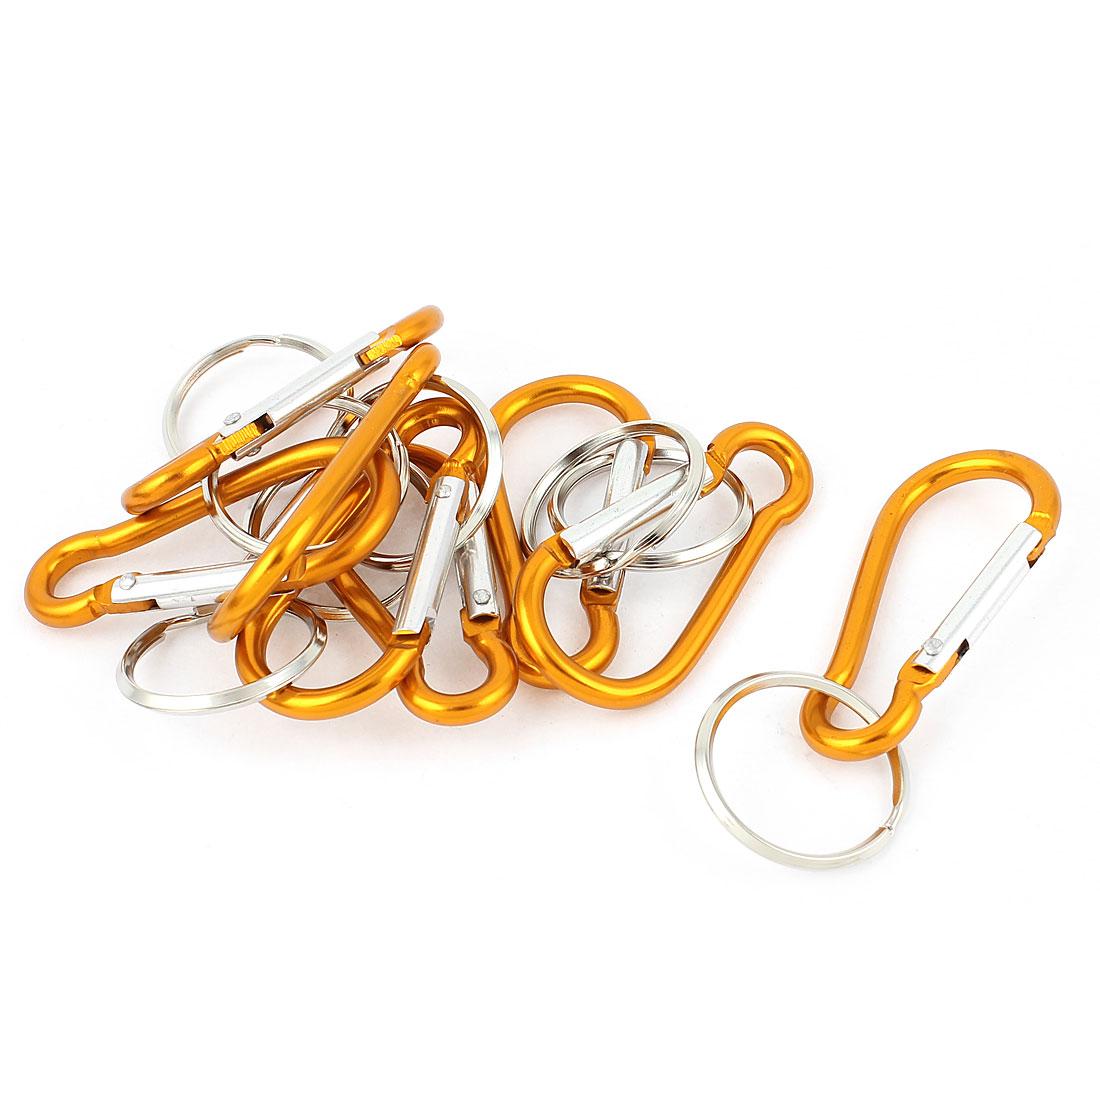 8pcs Orange Metal Carabiner Hike Clip Spring Hook Key Chain Fob Keyring Keychain